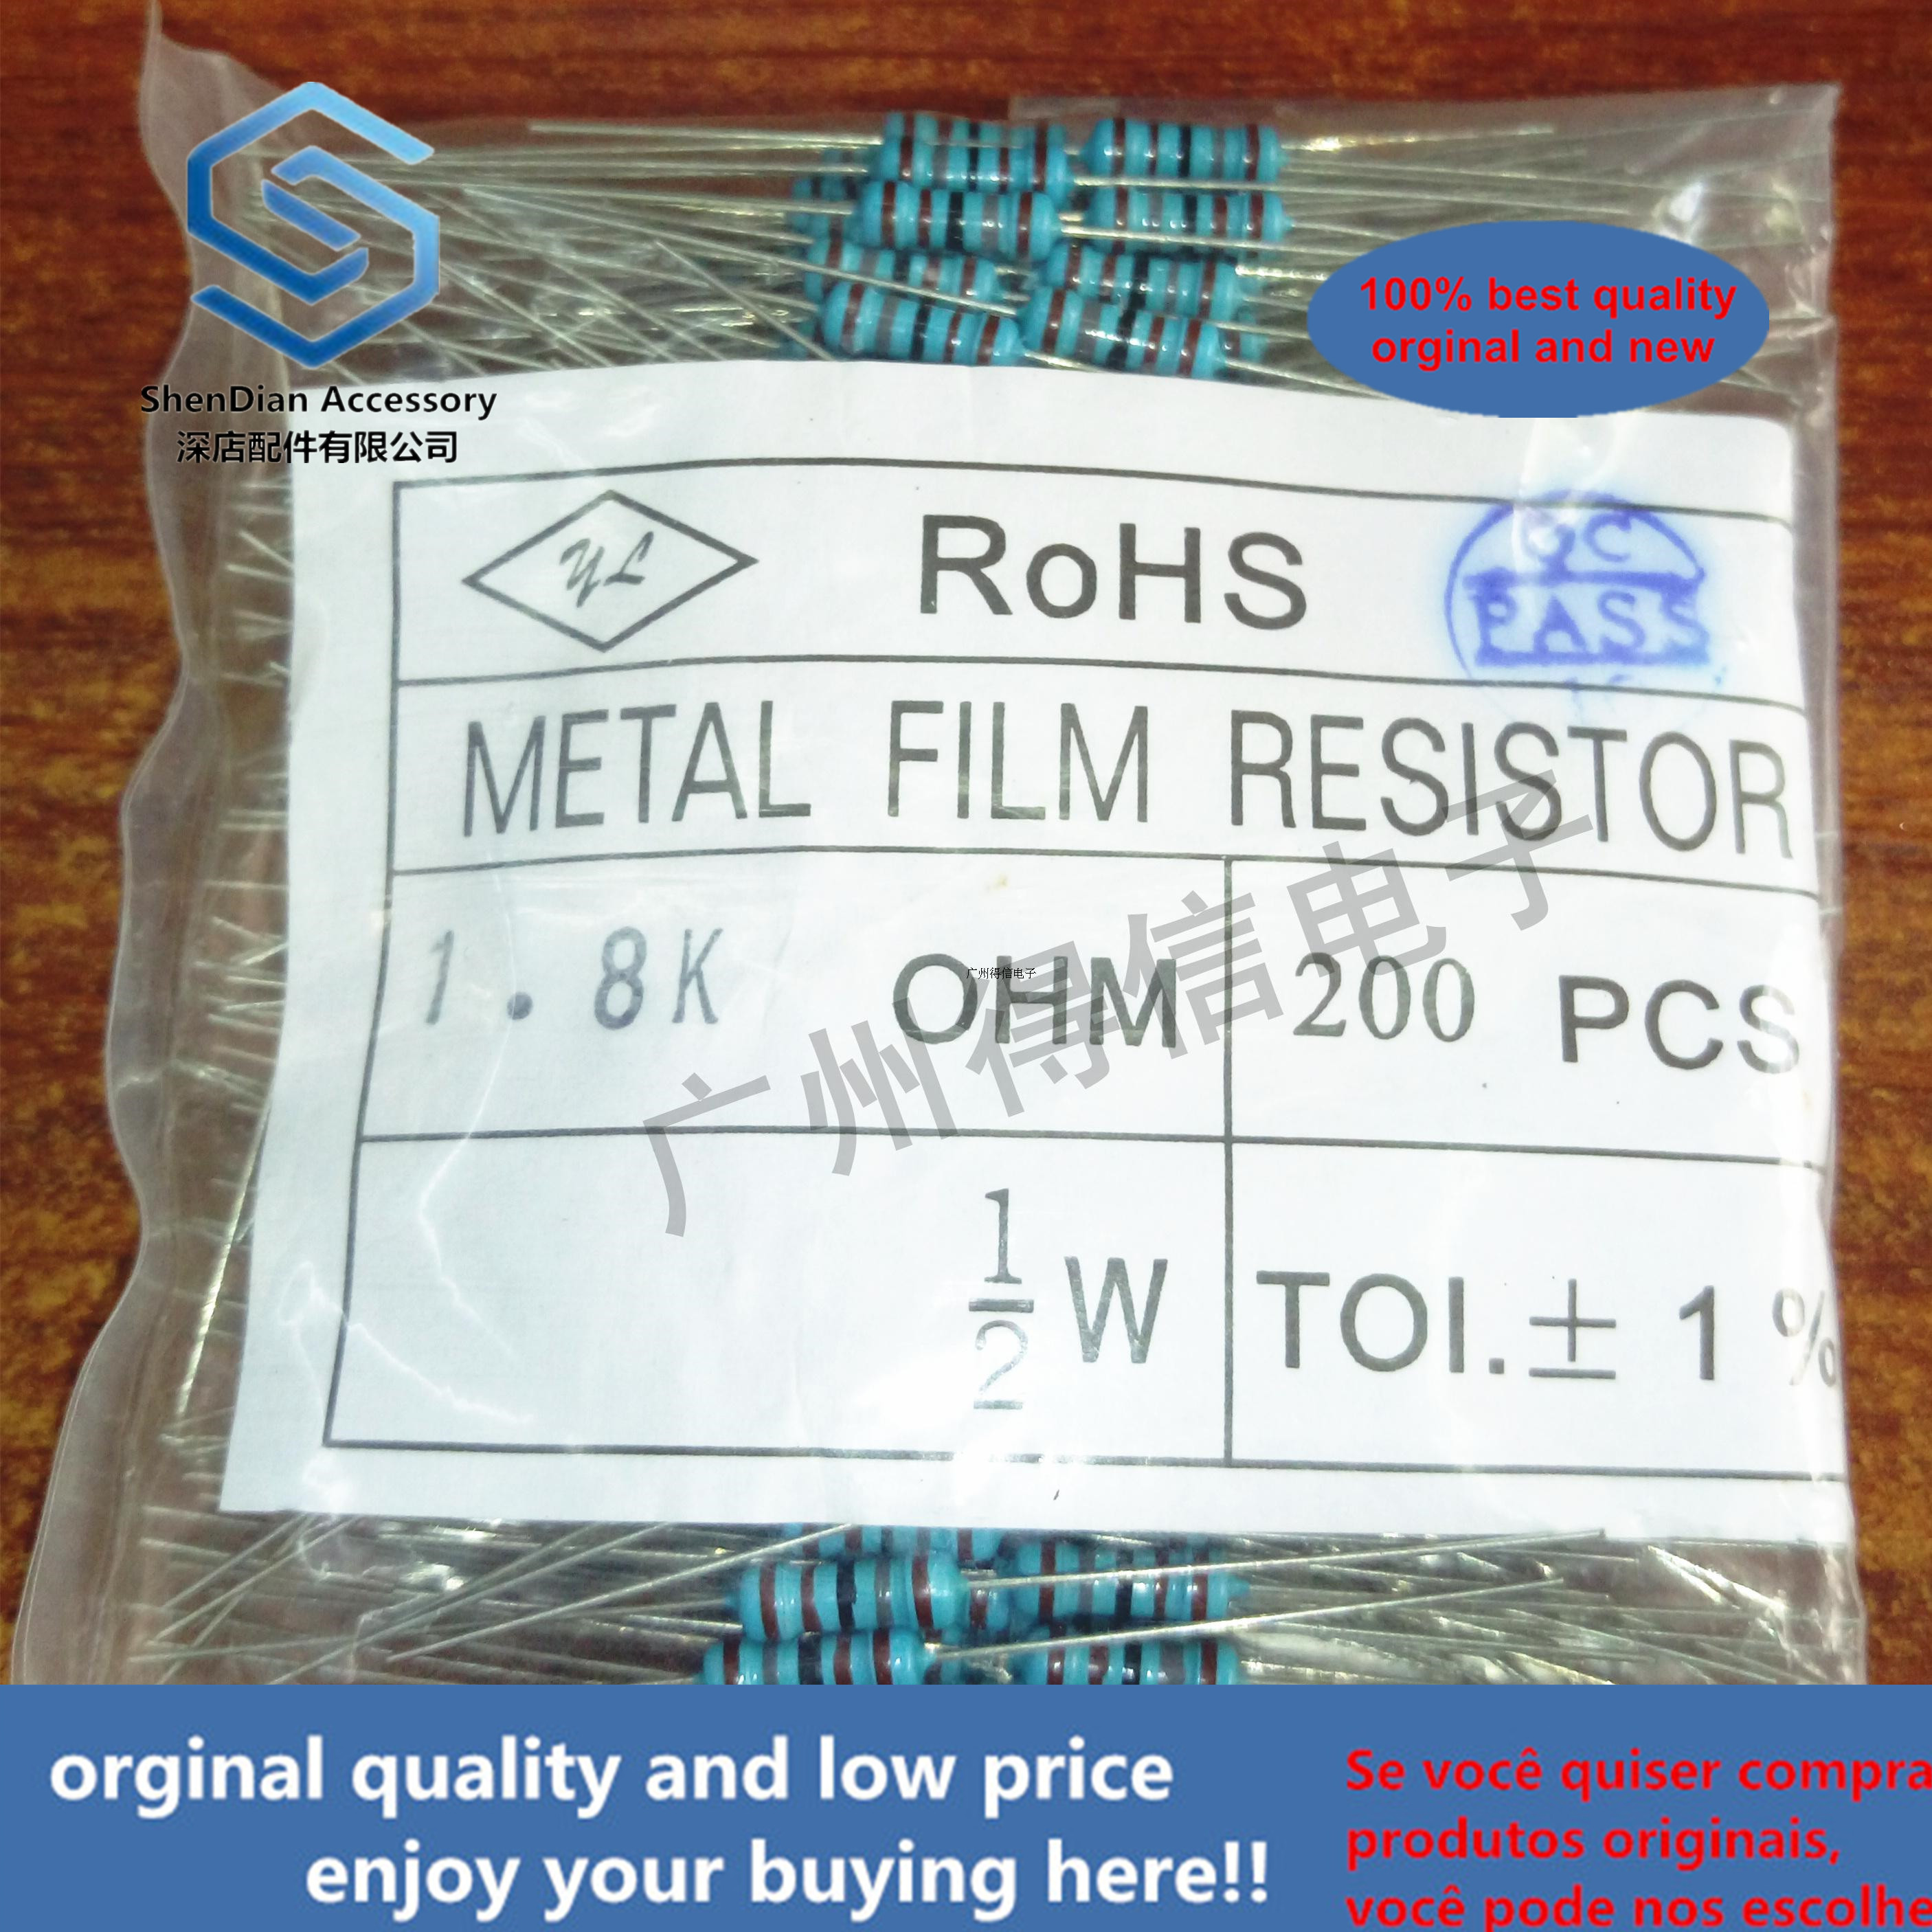 200pcs 1 / 2W 2.4K 2400 Euro 1% Brand New Metal Film Iron Feet Resistor Bag 200 Pcs Per Pack